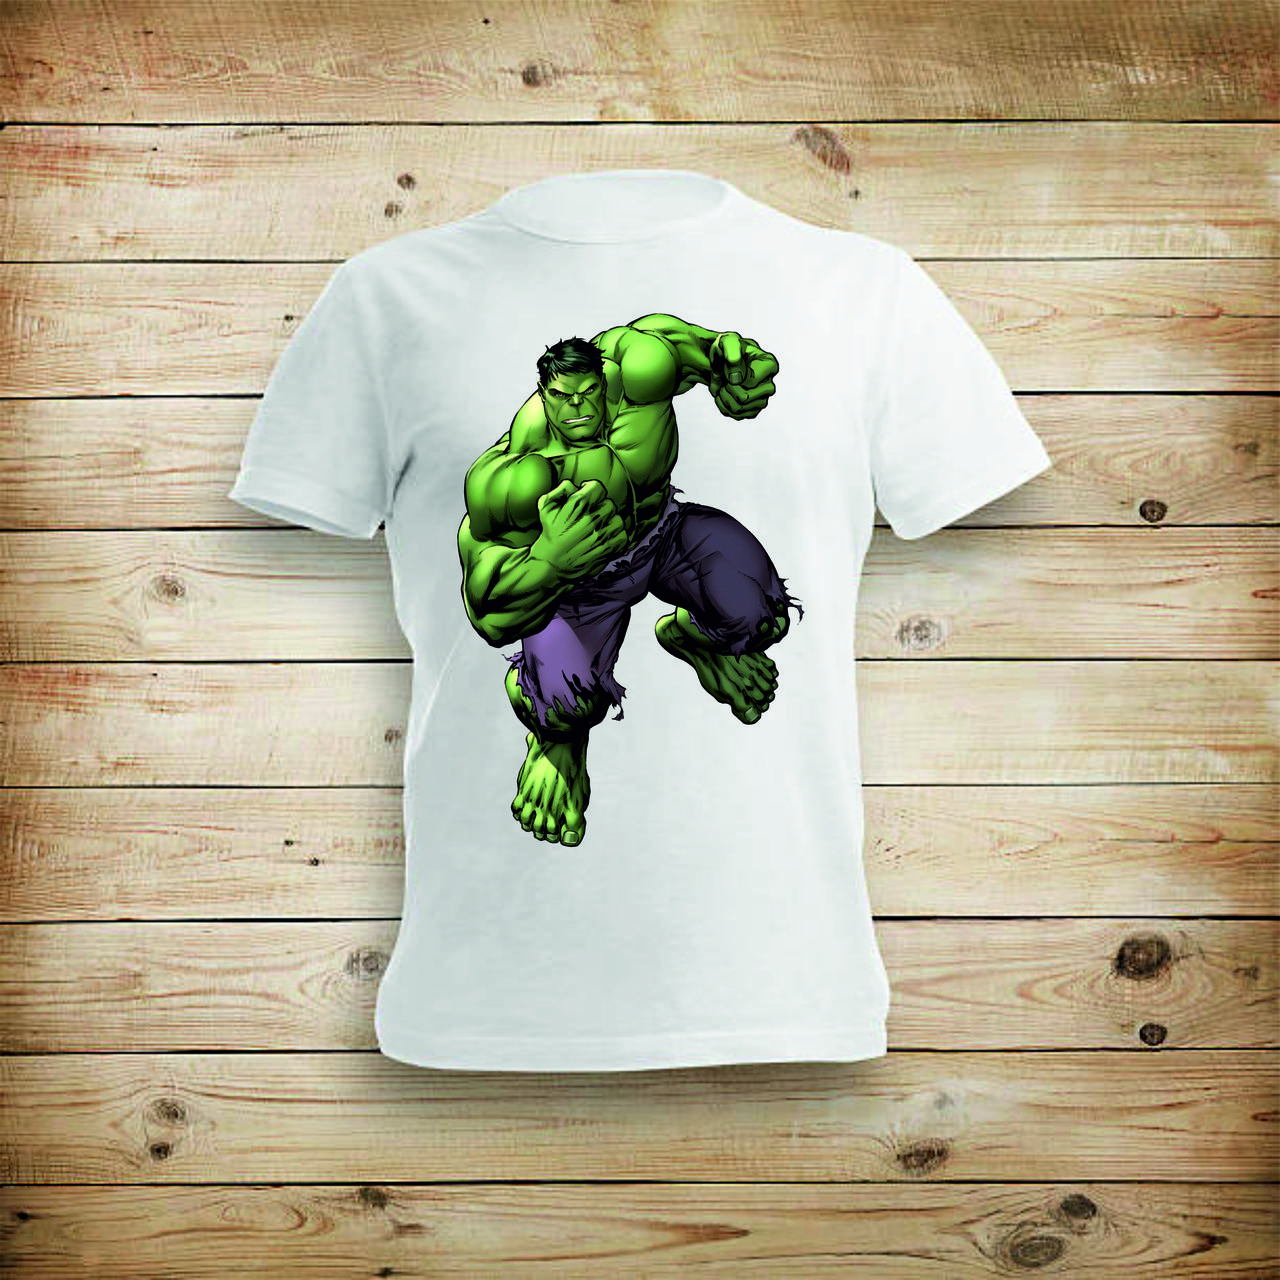 Футболка YOUstyle Hulk 0004 XXL White